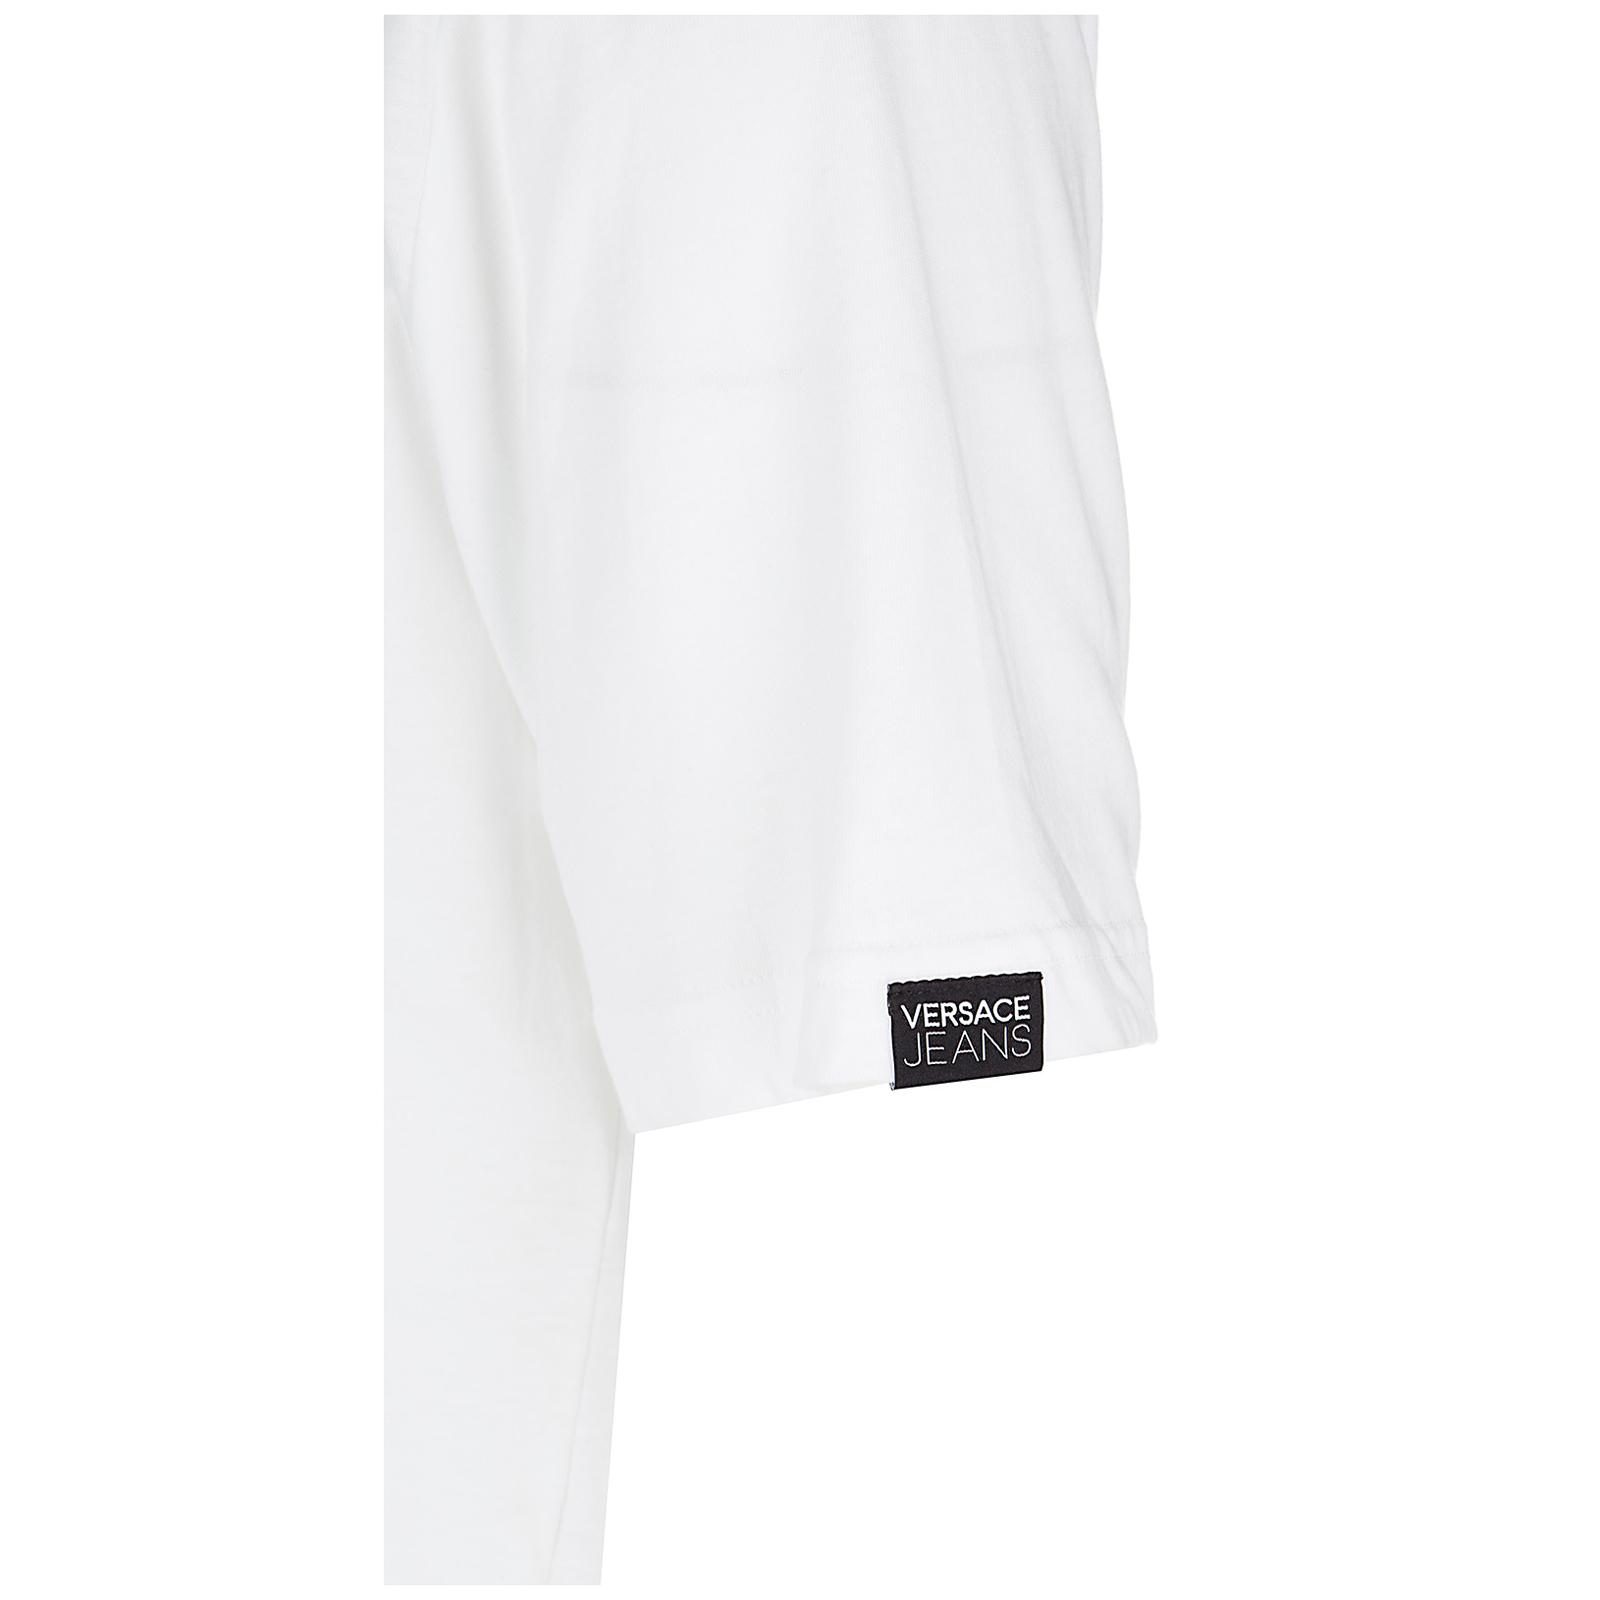 Men's short sleeve t-shirt crew neckline jumper jersey mark